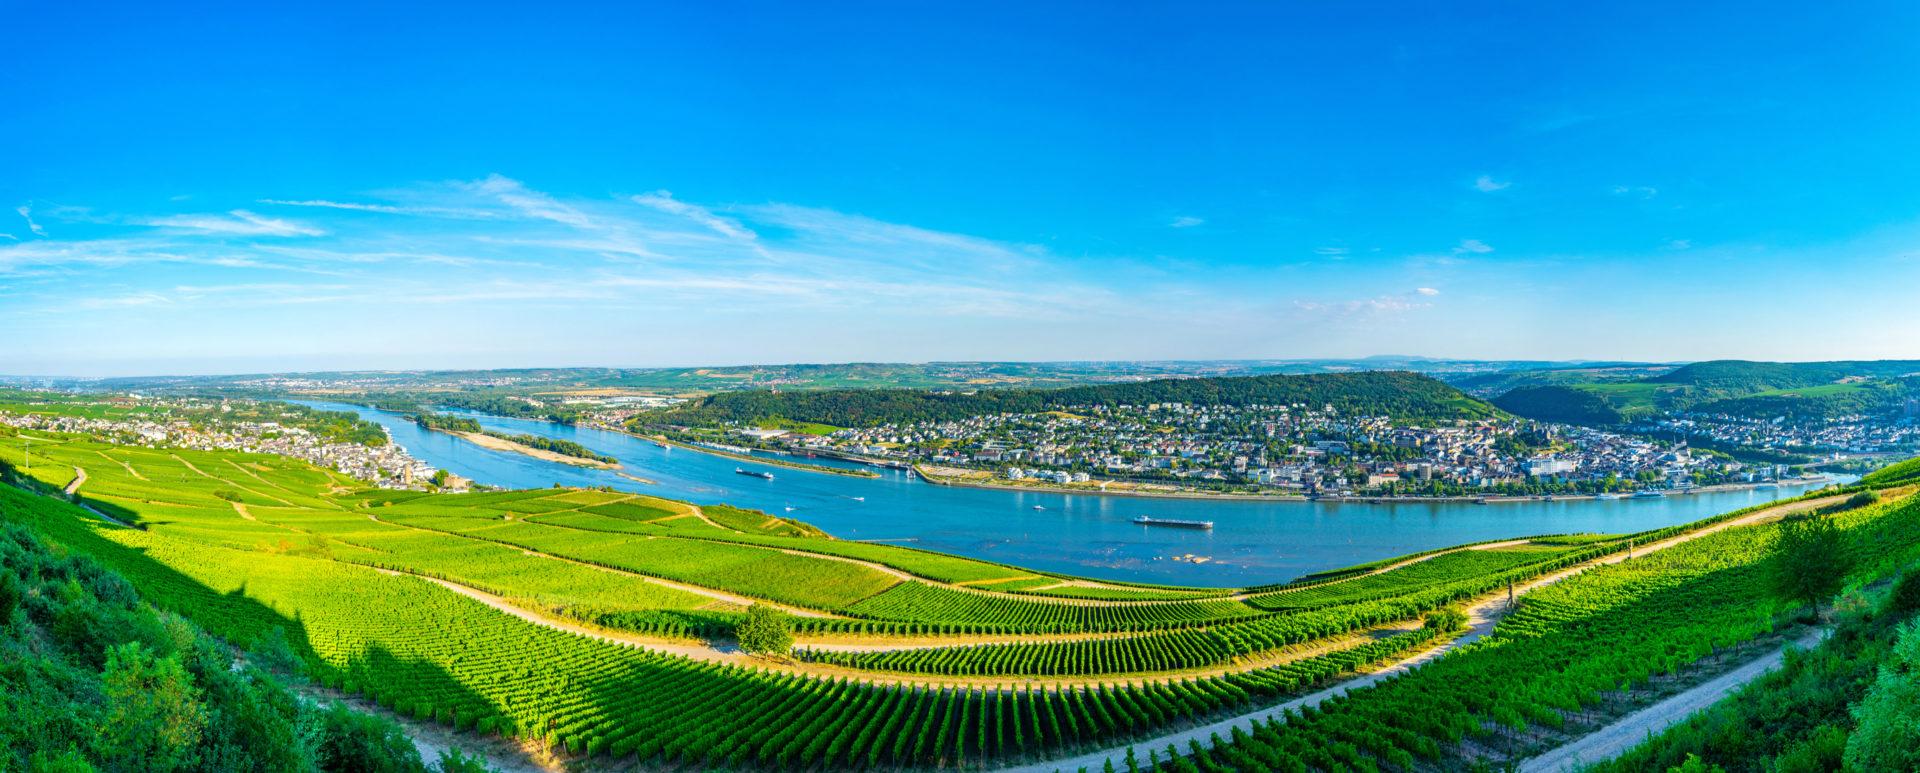 Die Kulturlandschaft Rheingau nahe des Hofgut Georgenthal